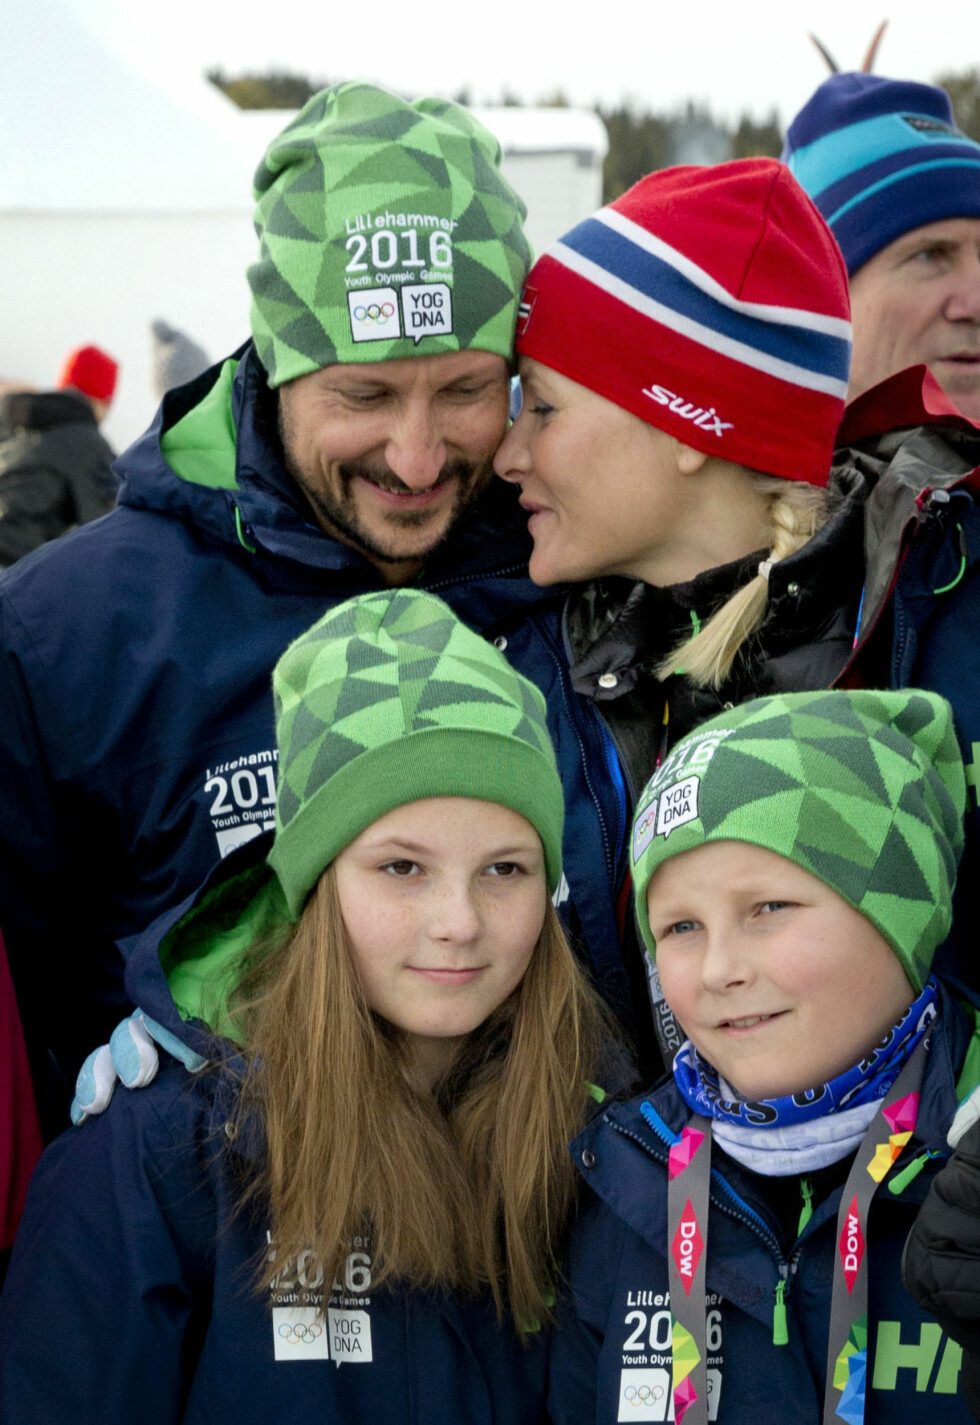 2016: Med Ingrid Alexandra og Sverre Magnus på Lillehammer i februar i år.   Foto: Danapress